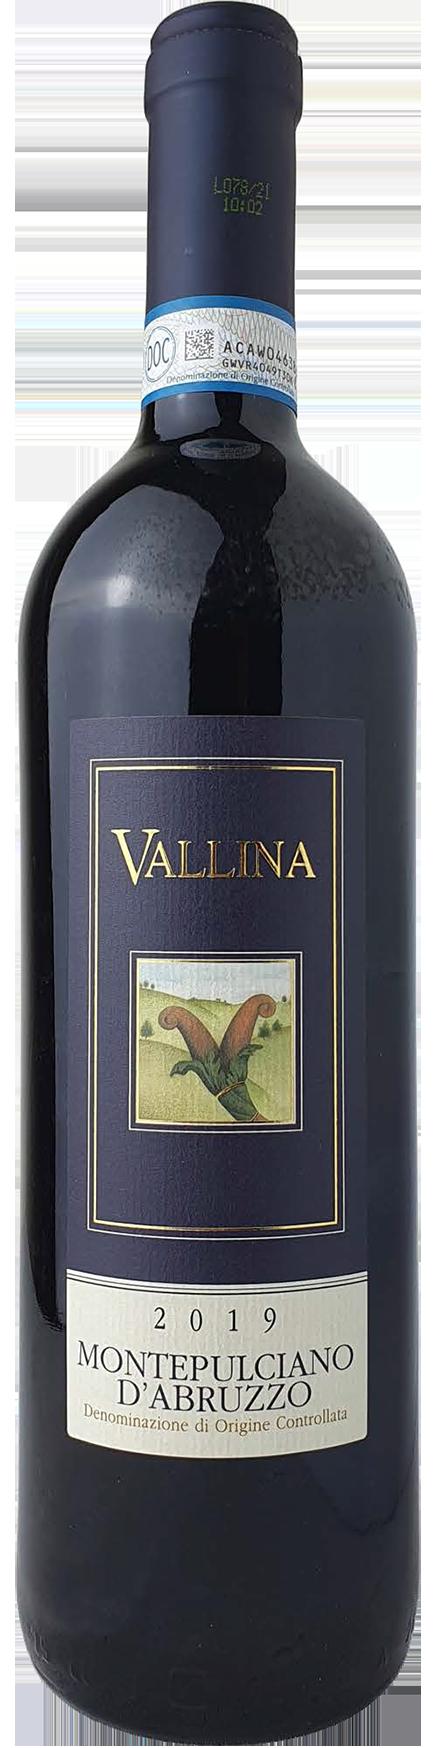 2019 Vallina Montepulciano